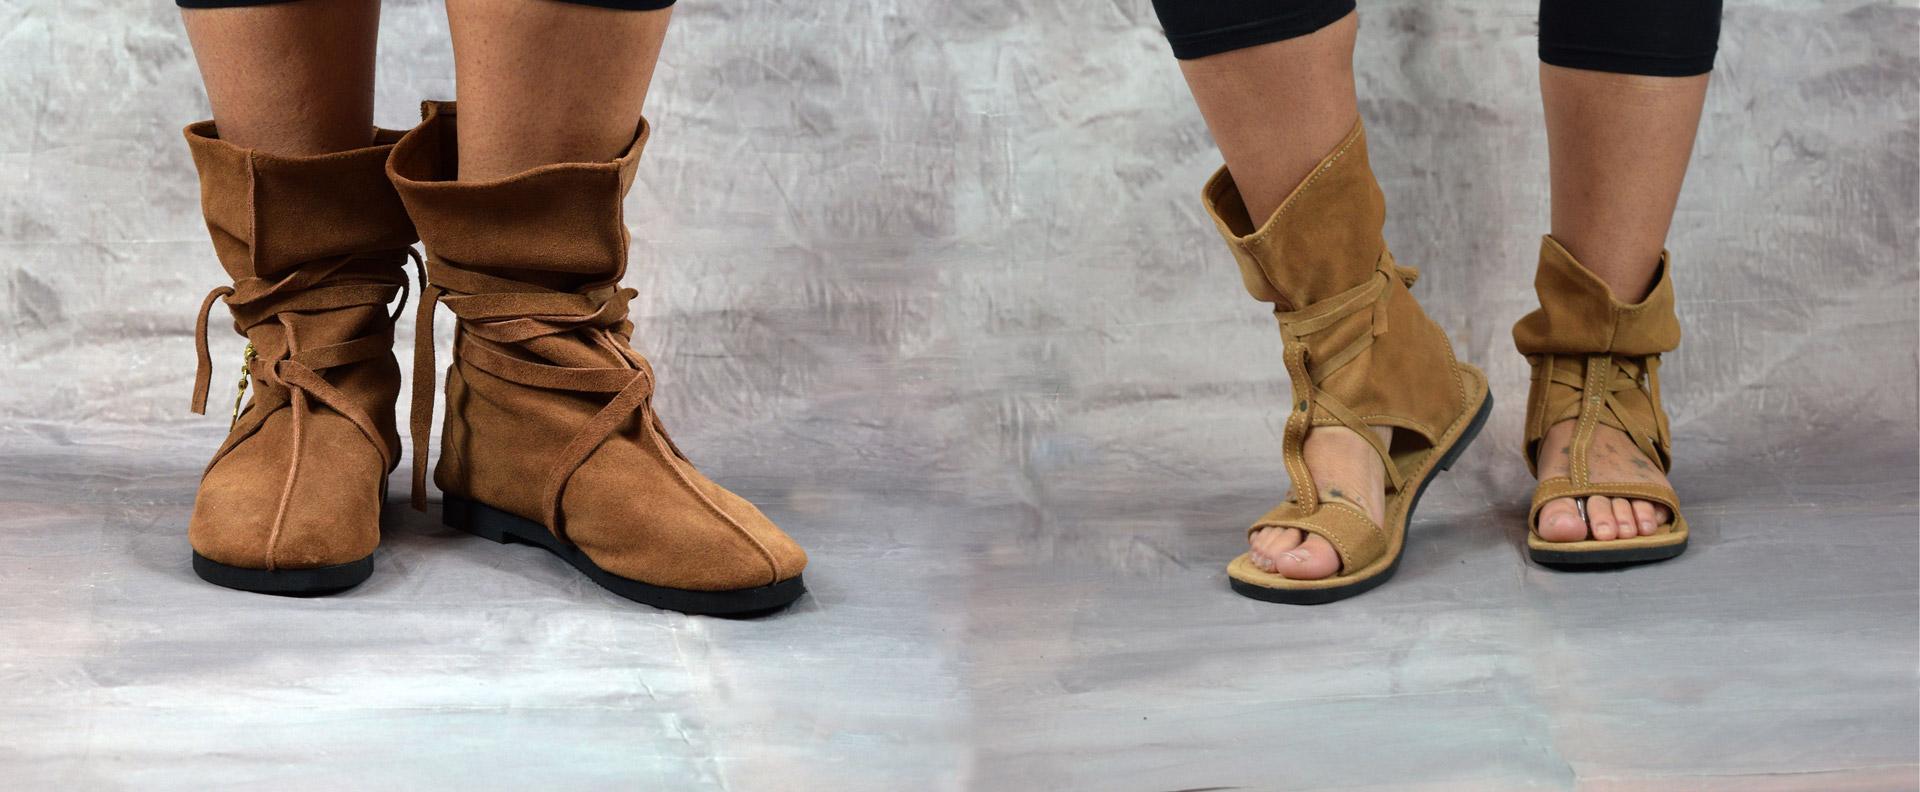 Wobble & Squeak Footwear